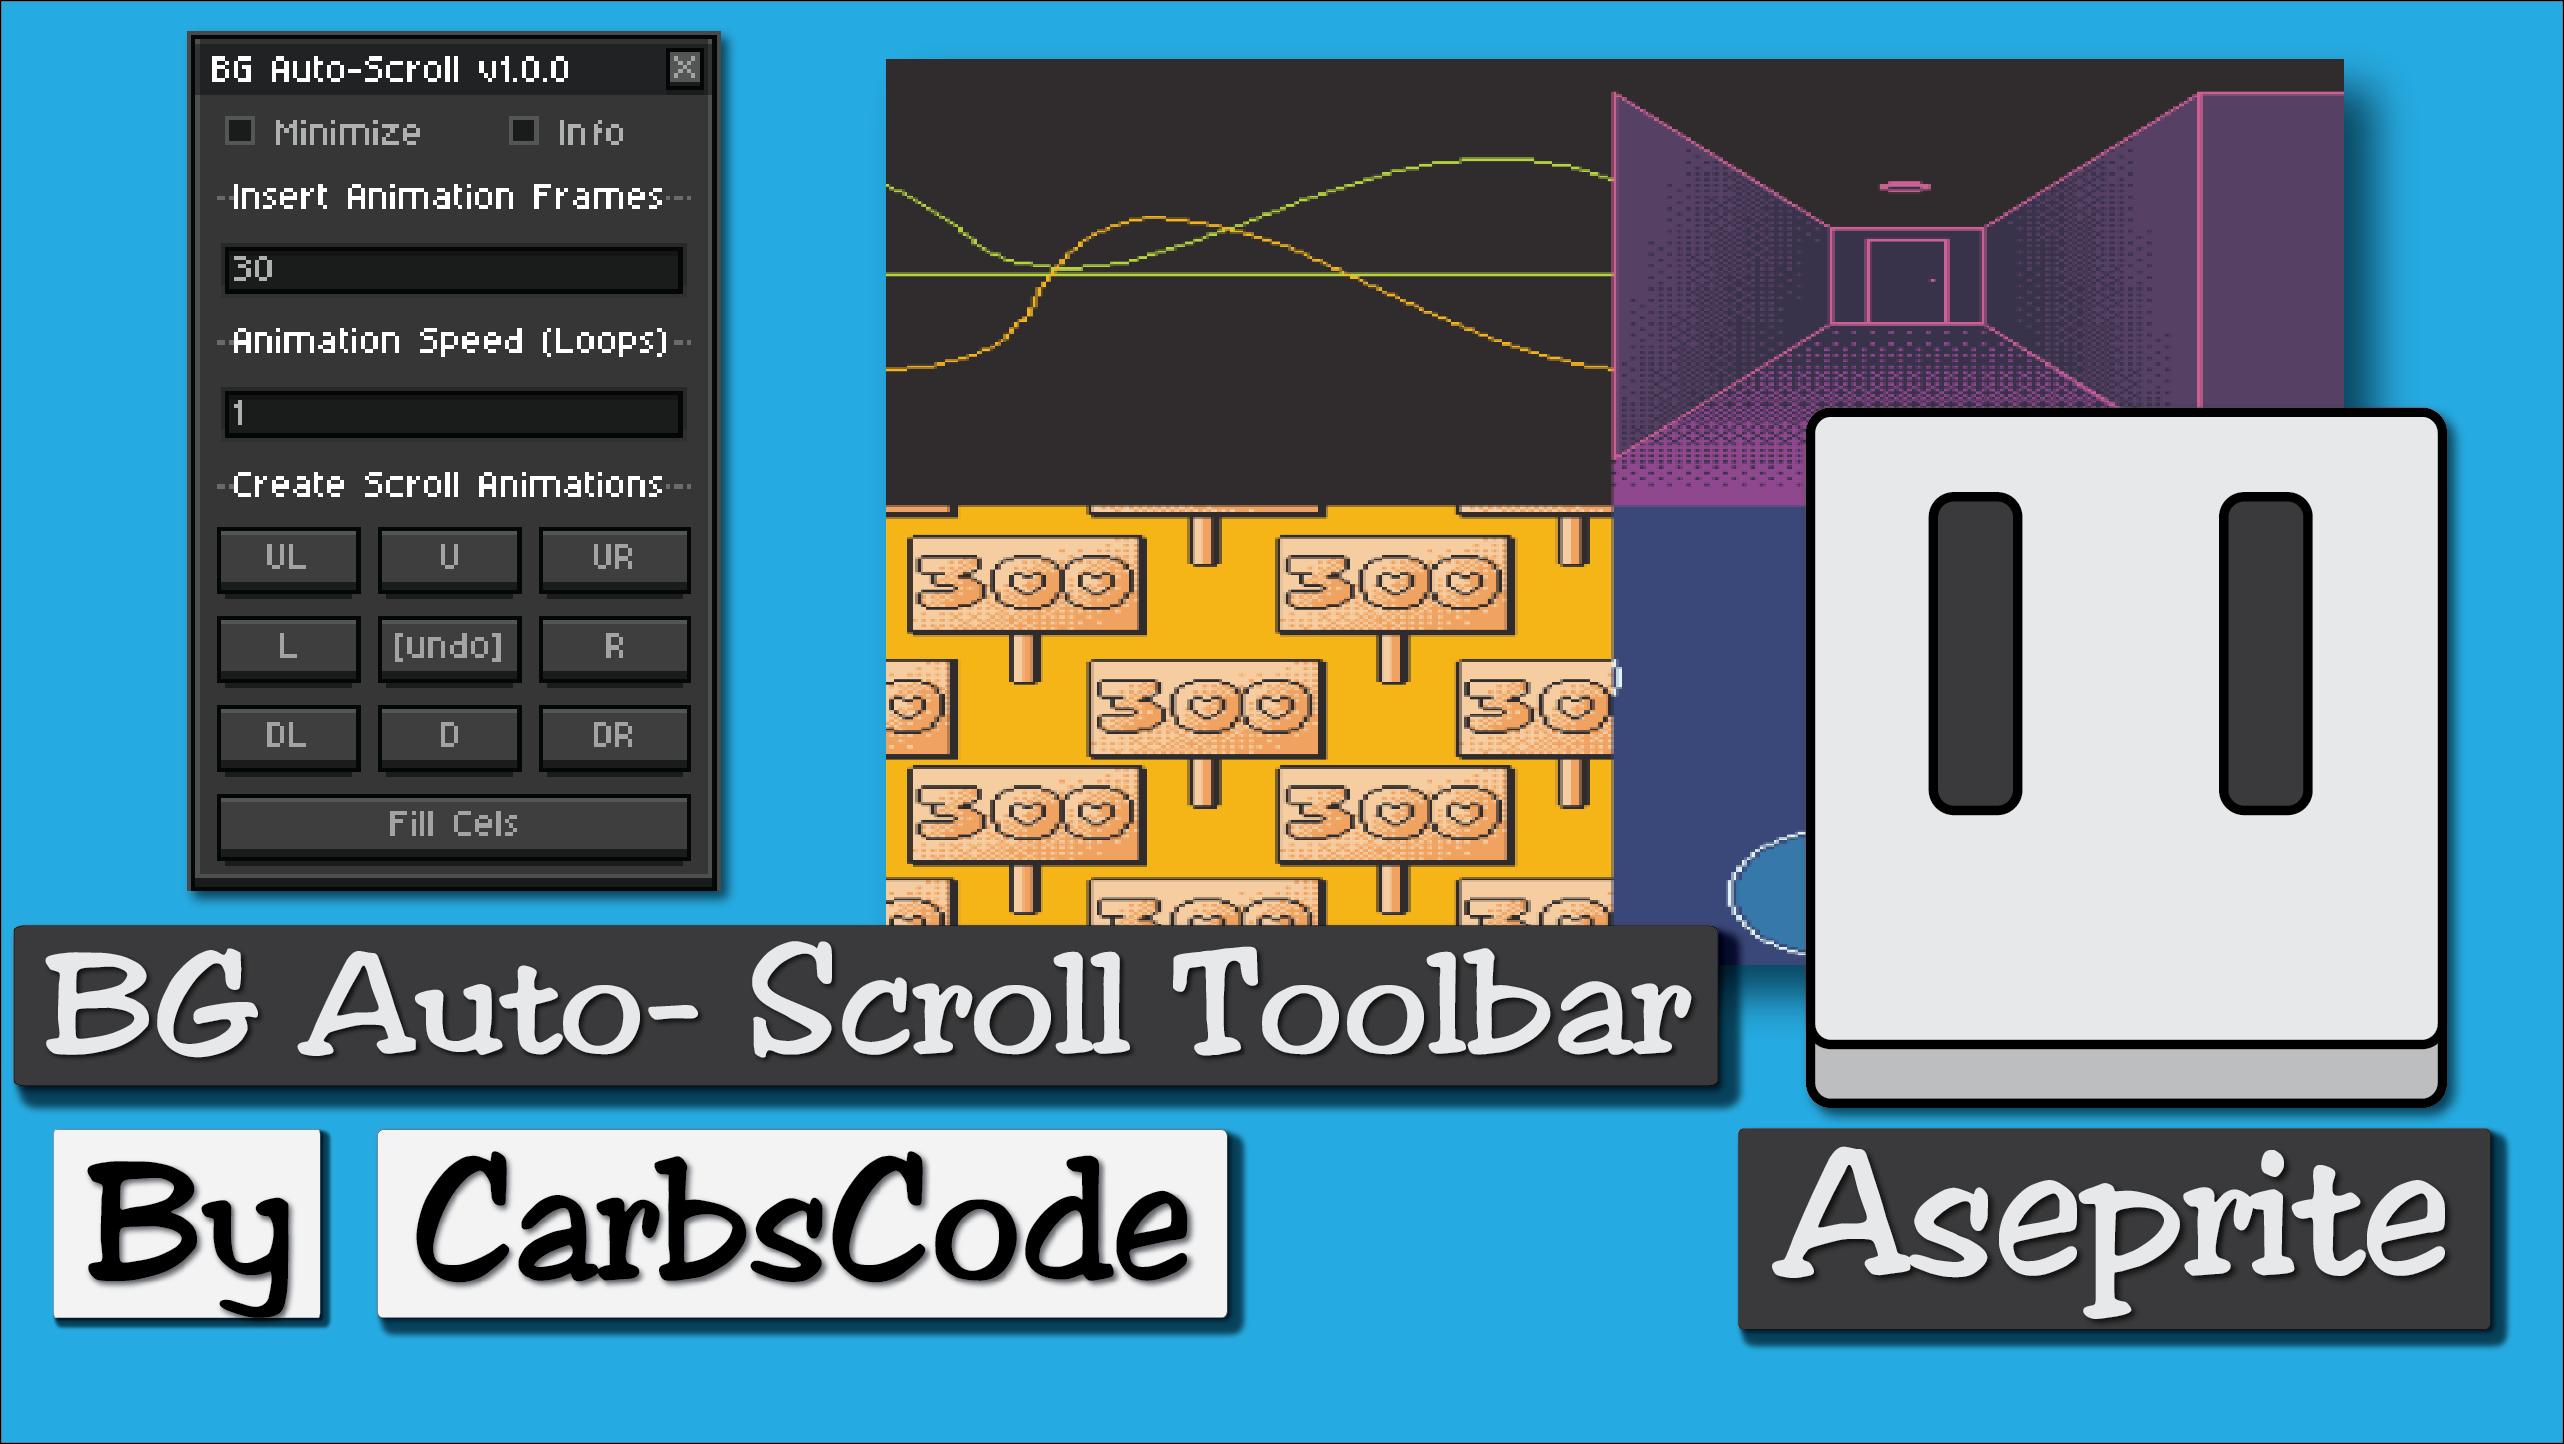 BG Auto-Scroll Toolbar